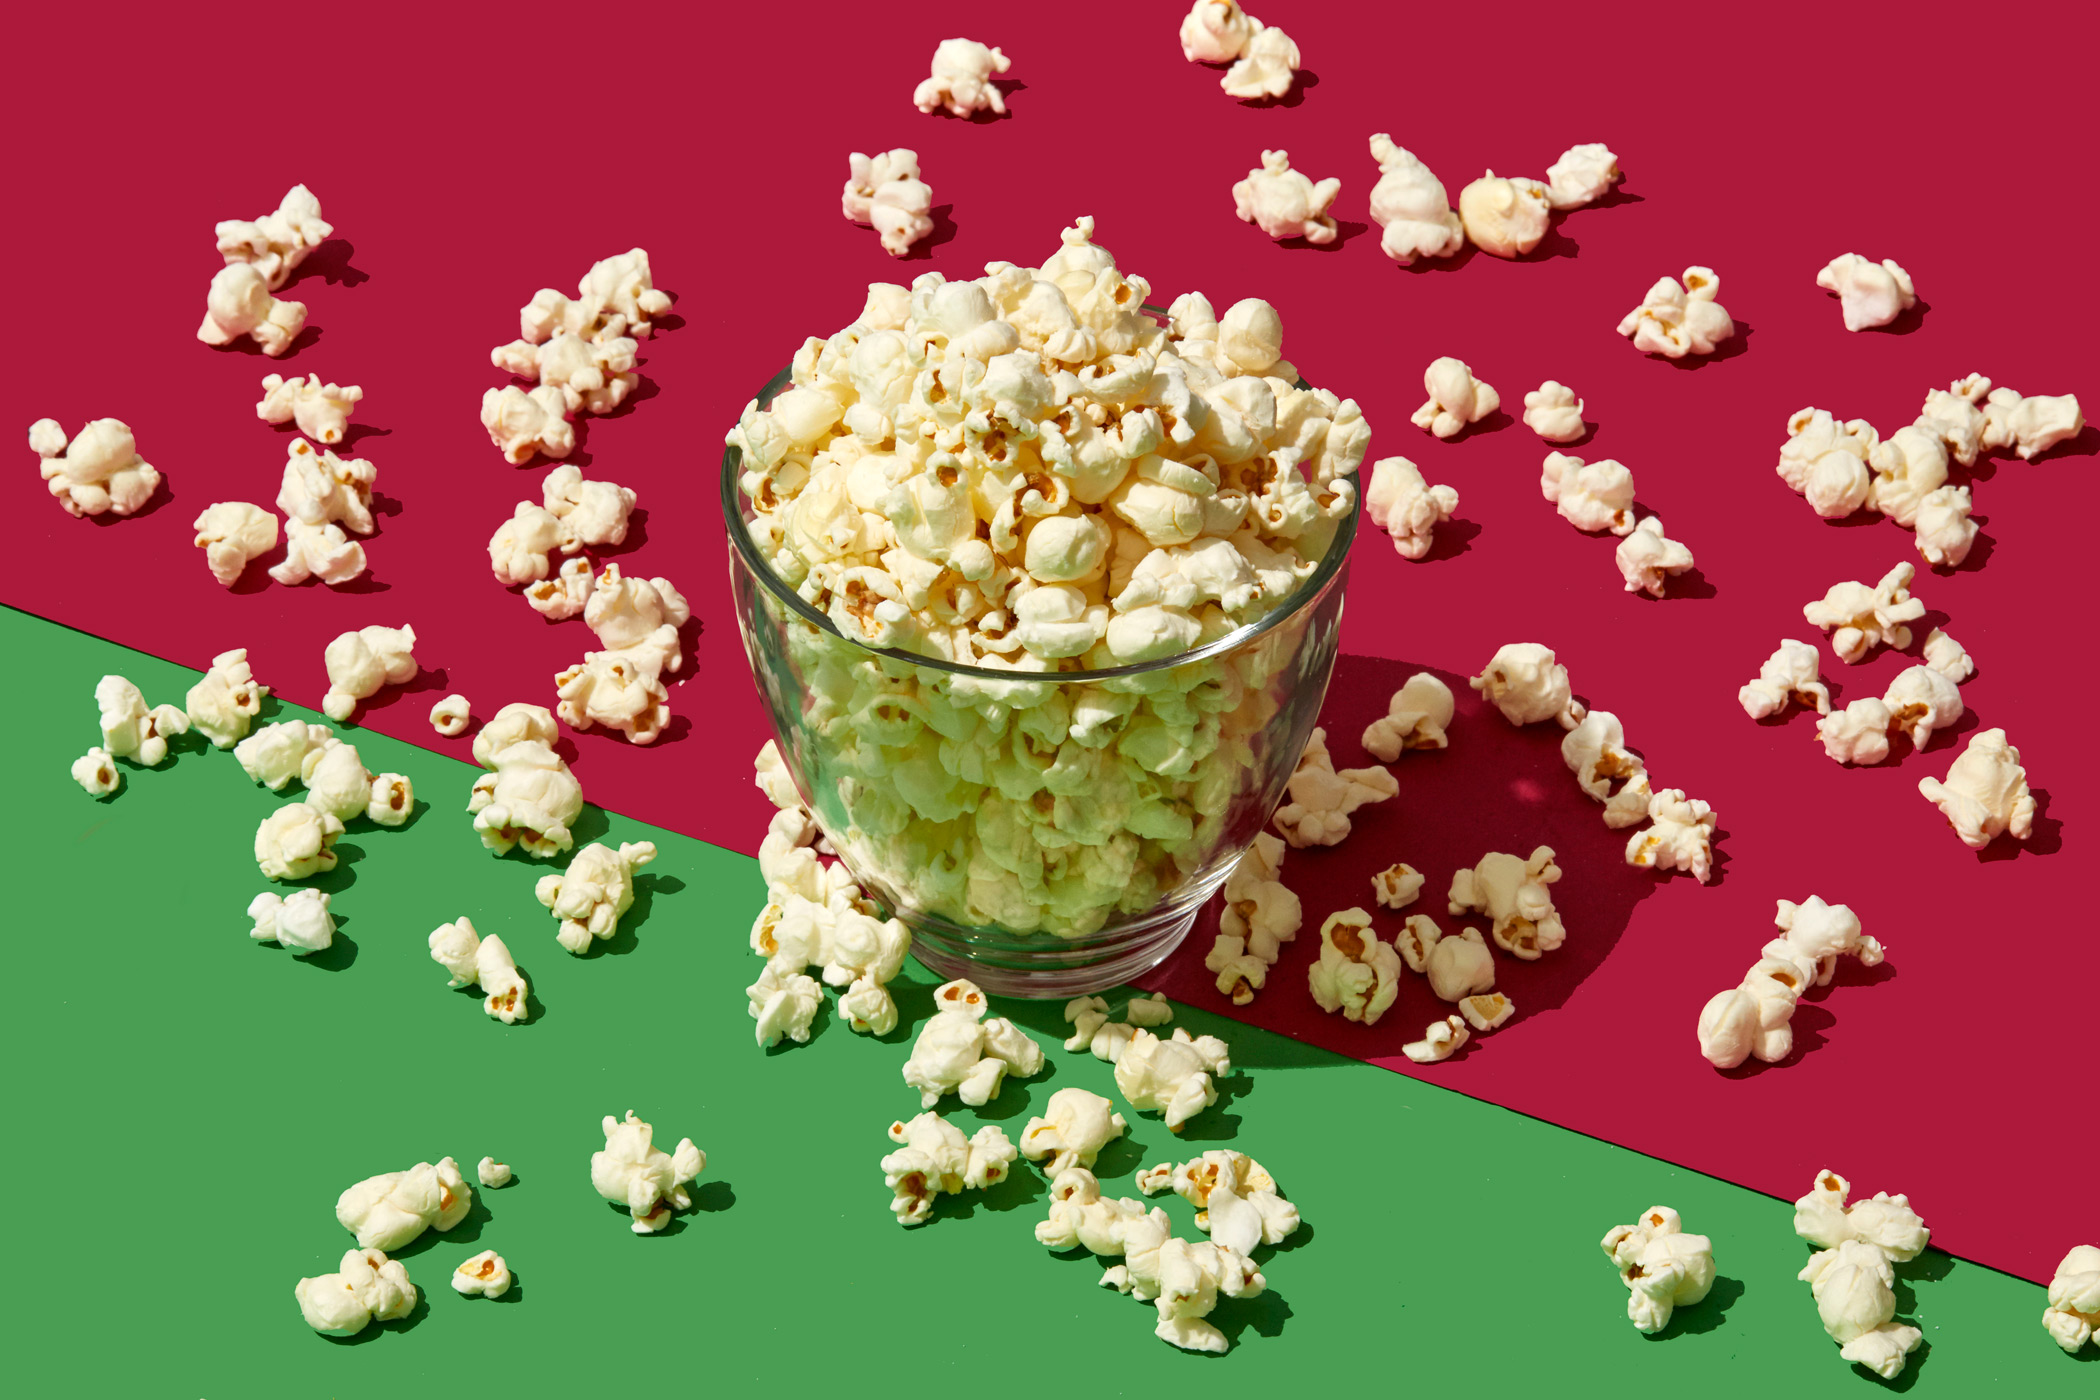 healthiest foods, health food, diet, nutrition, time.com stock, popcorn